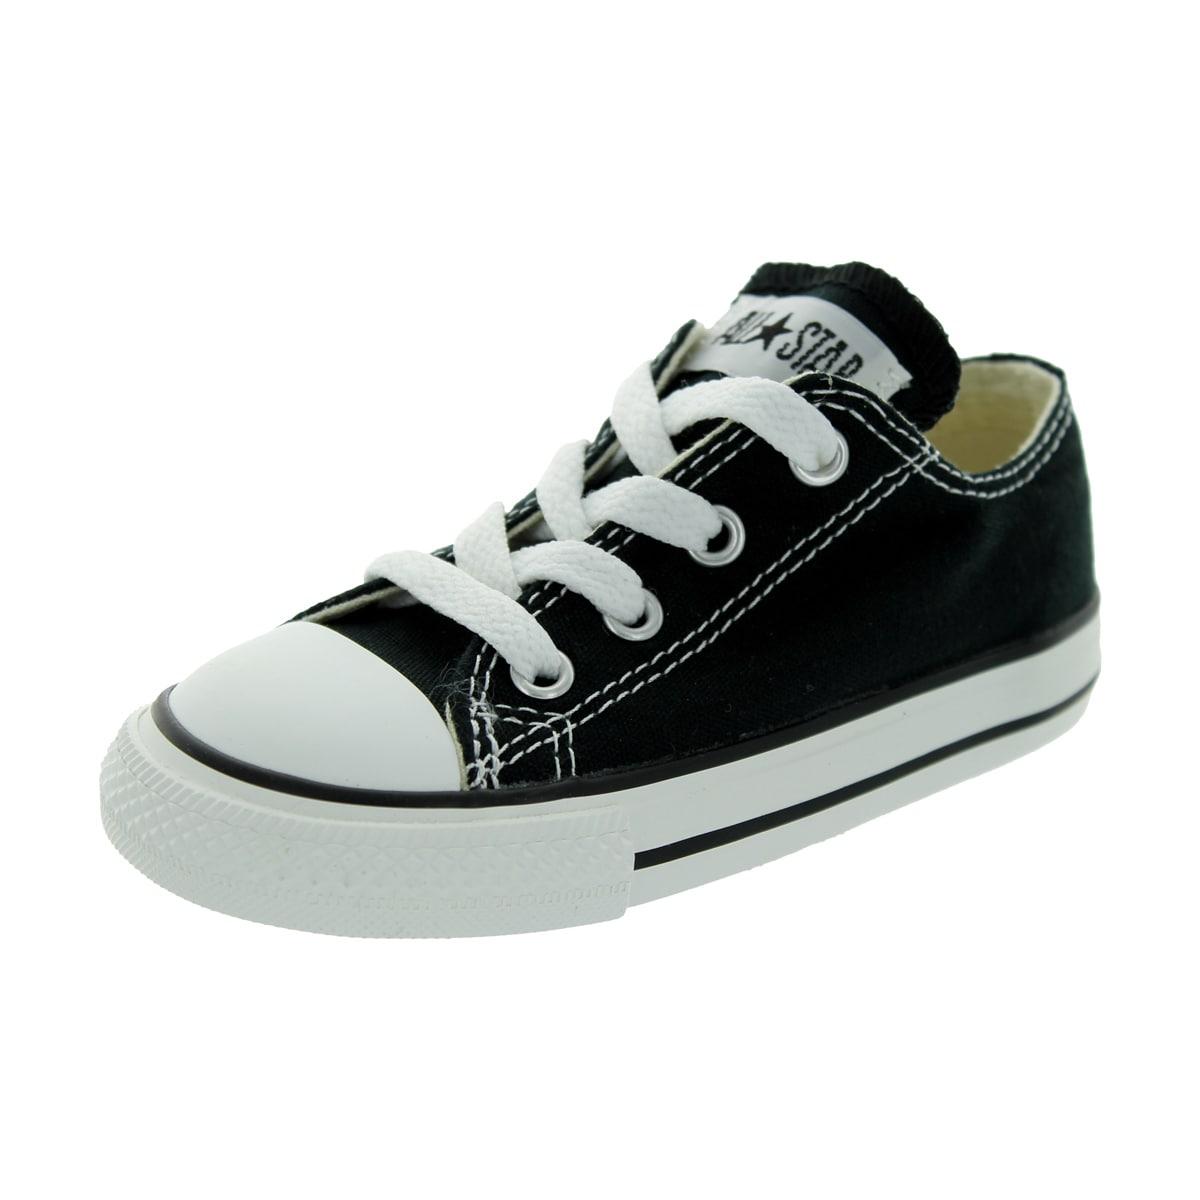 Converse Infants' Chuck Taylor A/S Oxford Basketball Shoe...